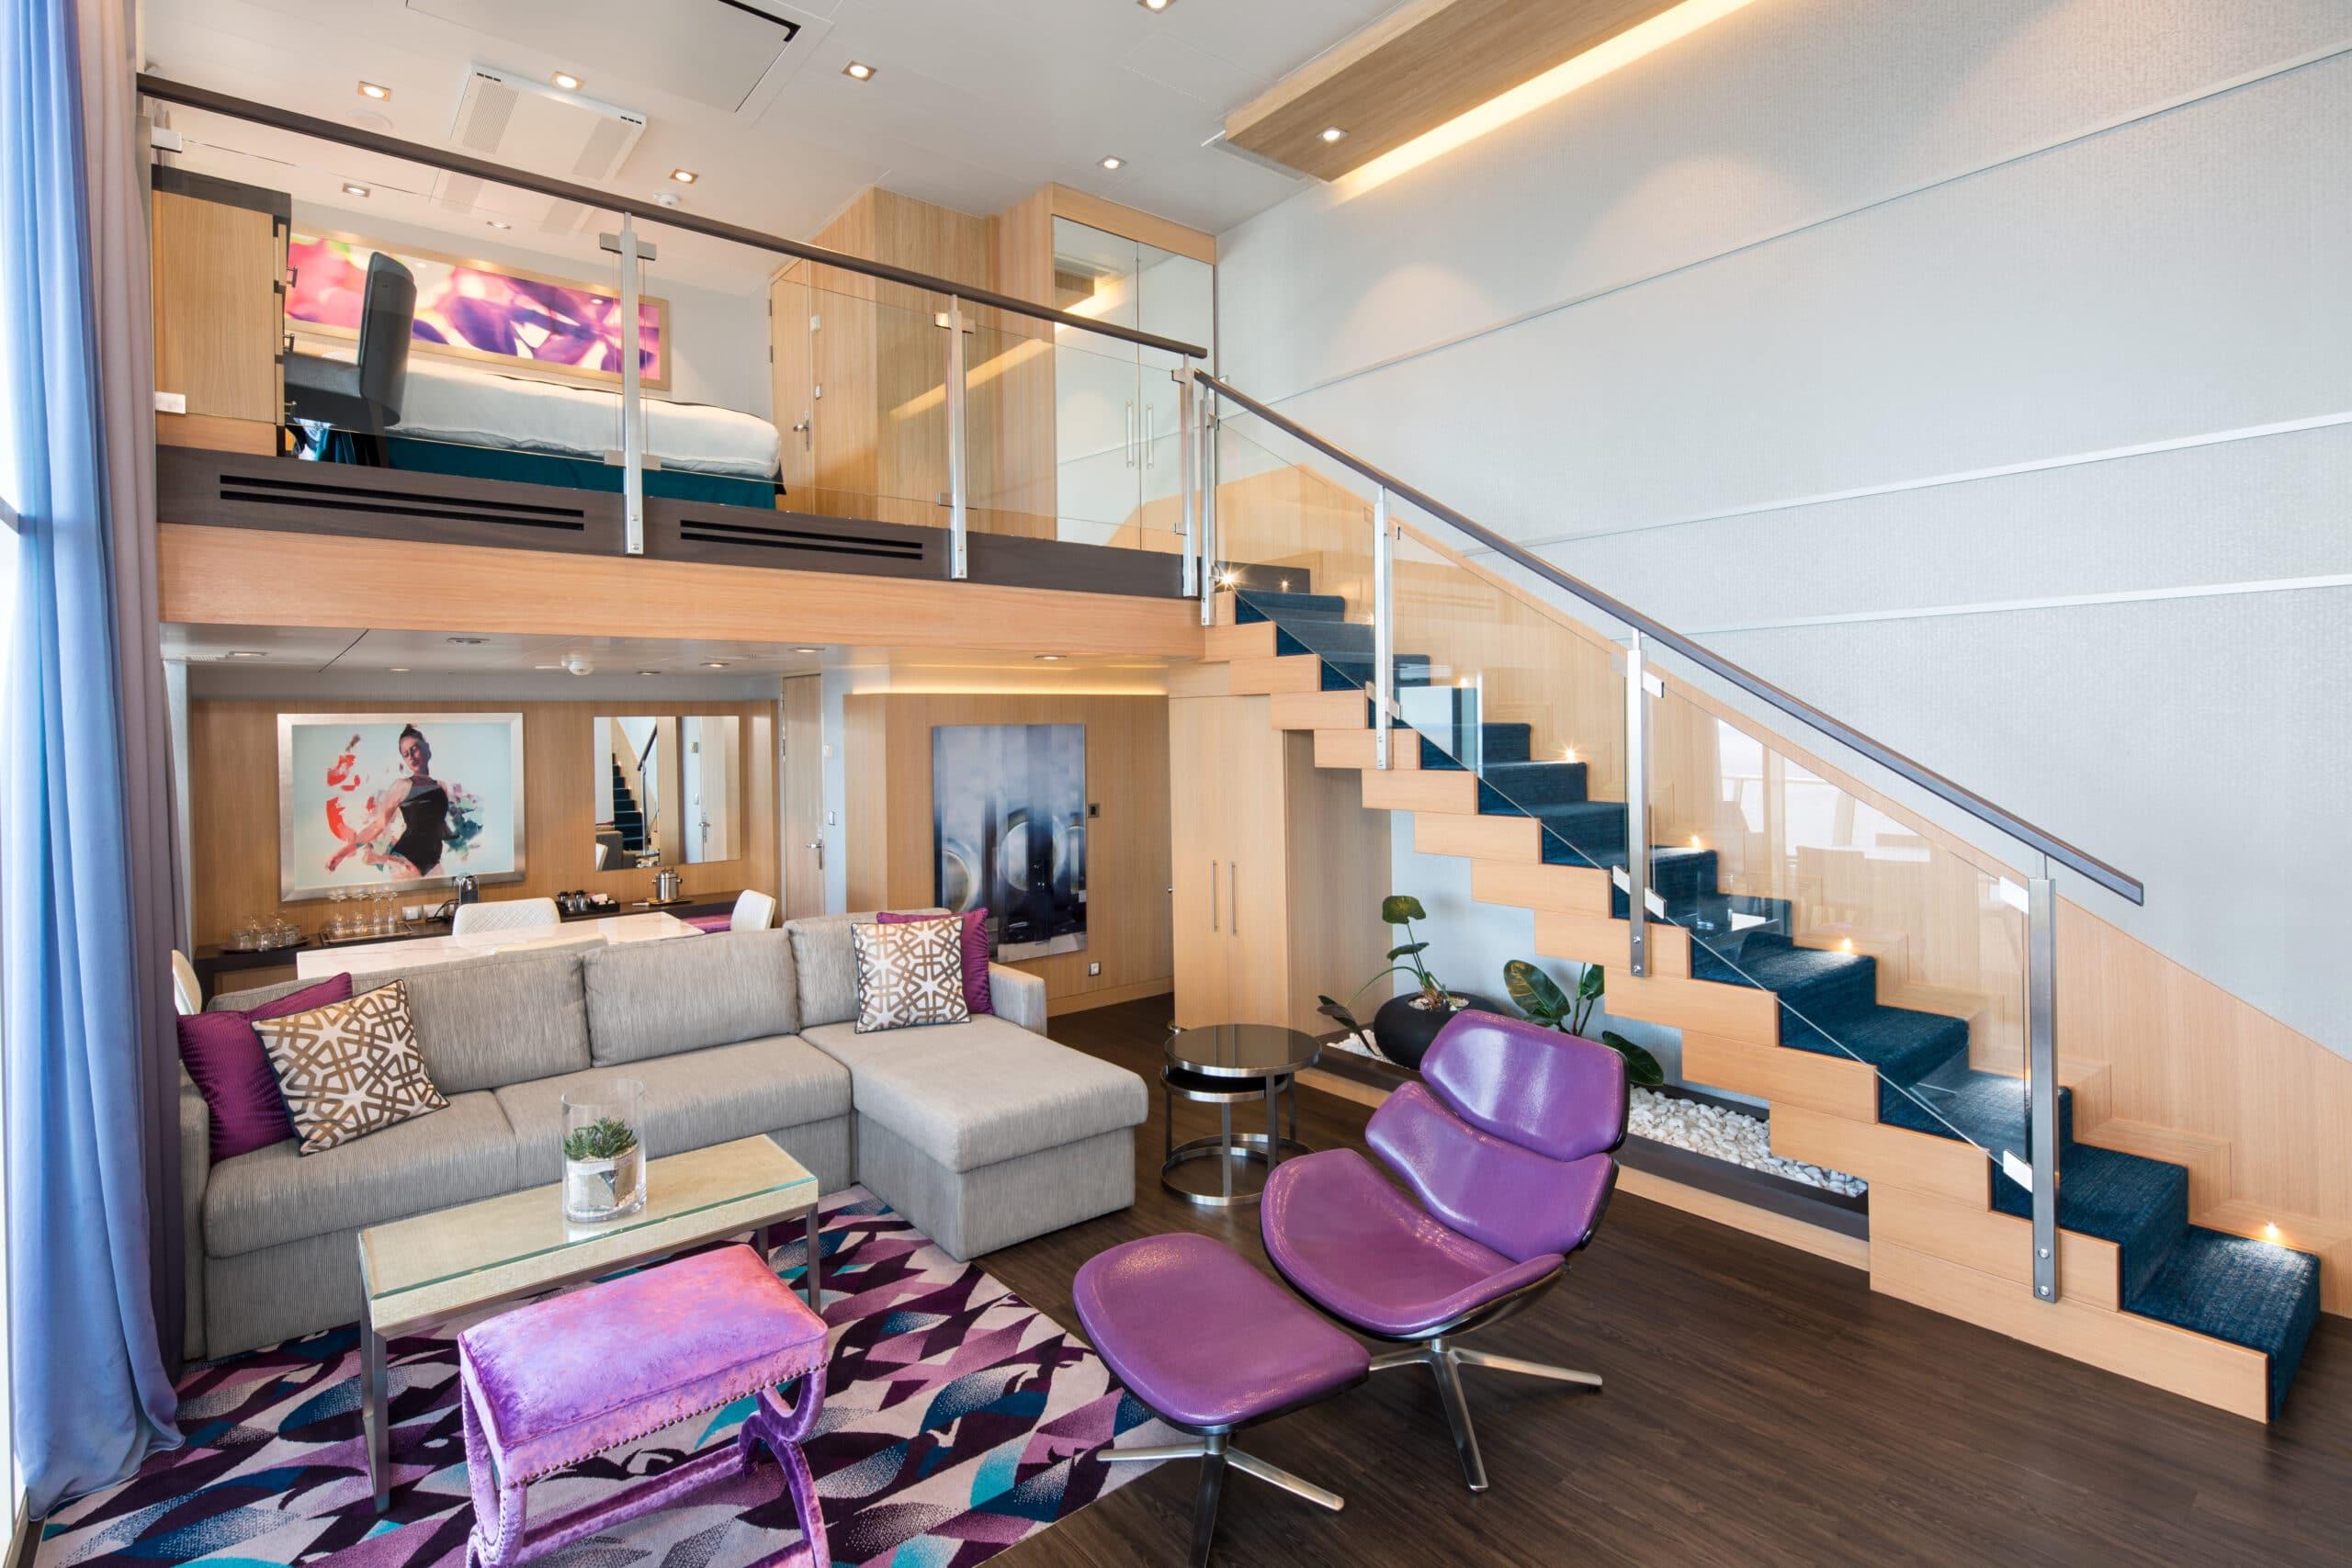 Royal-Caribbean-International-Harmony-of-the-Seas-Symphony-of-the-seas-schip-cruiseschip-categorie-TL-Star-Loft-Suite